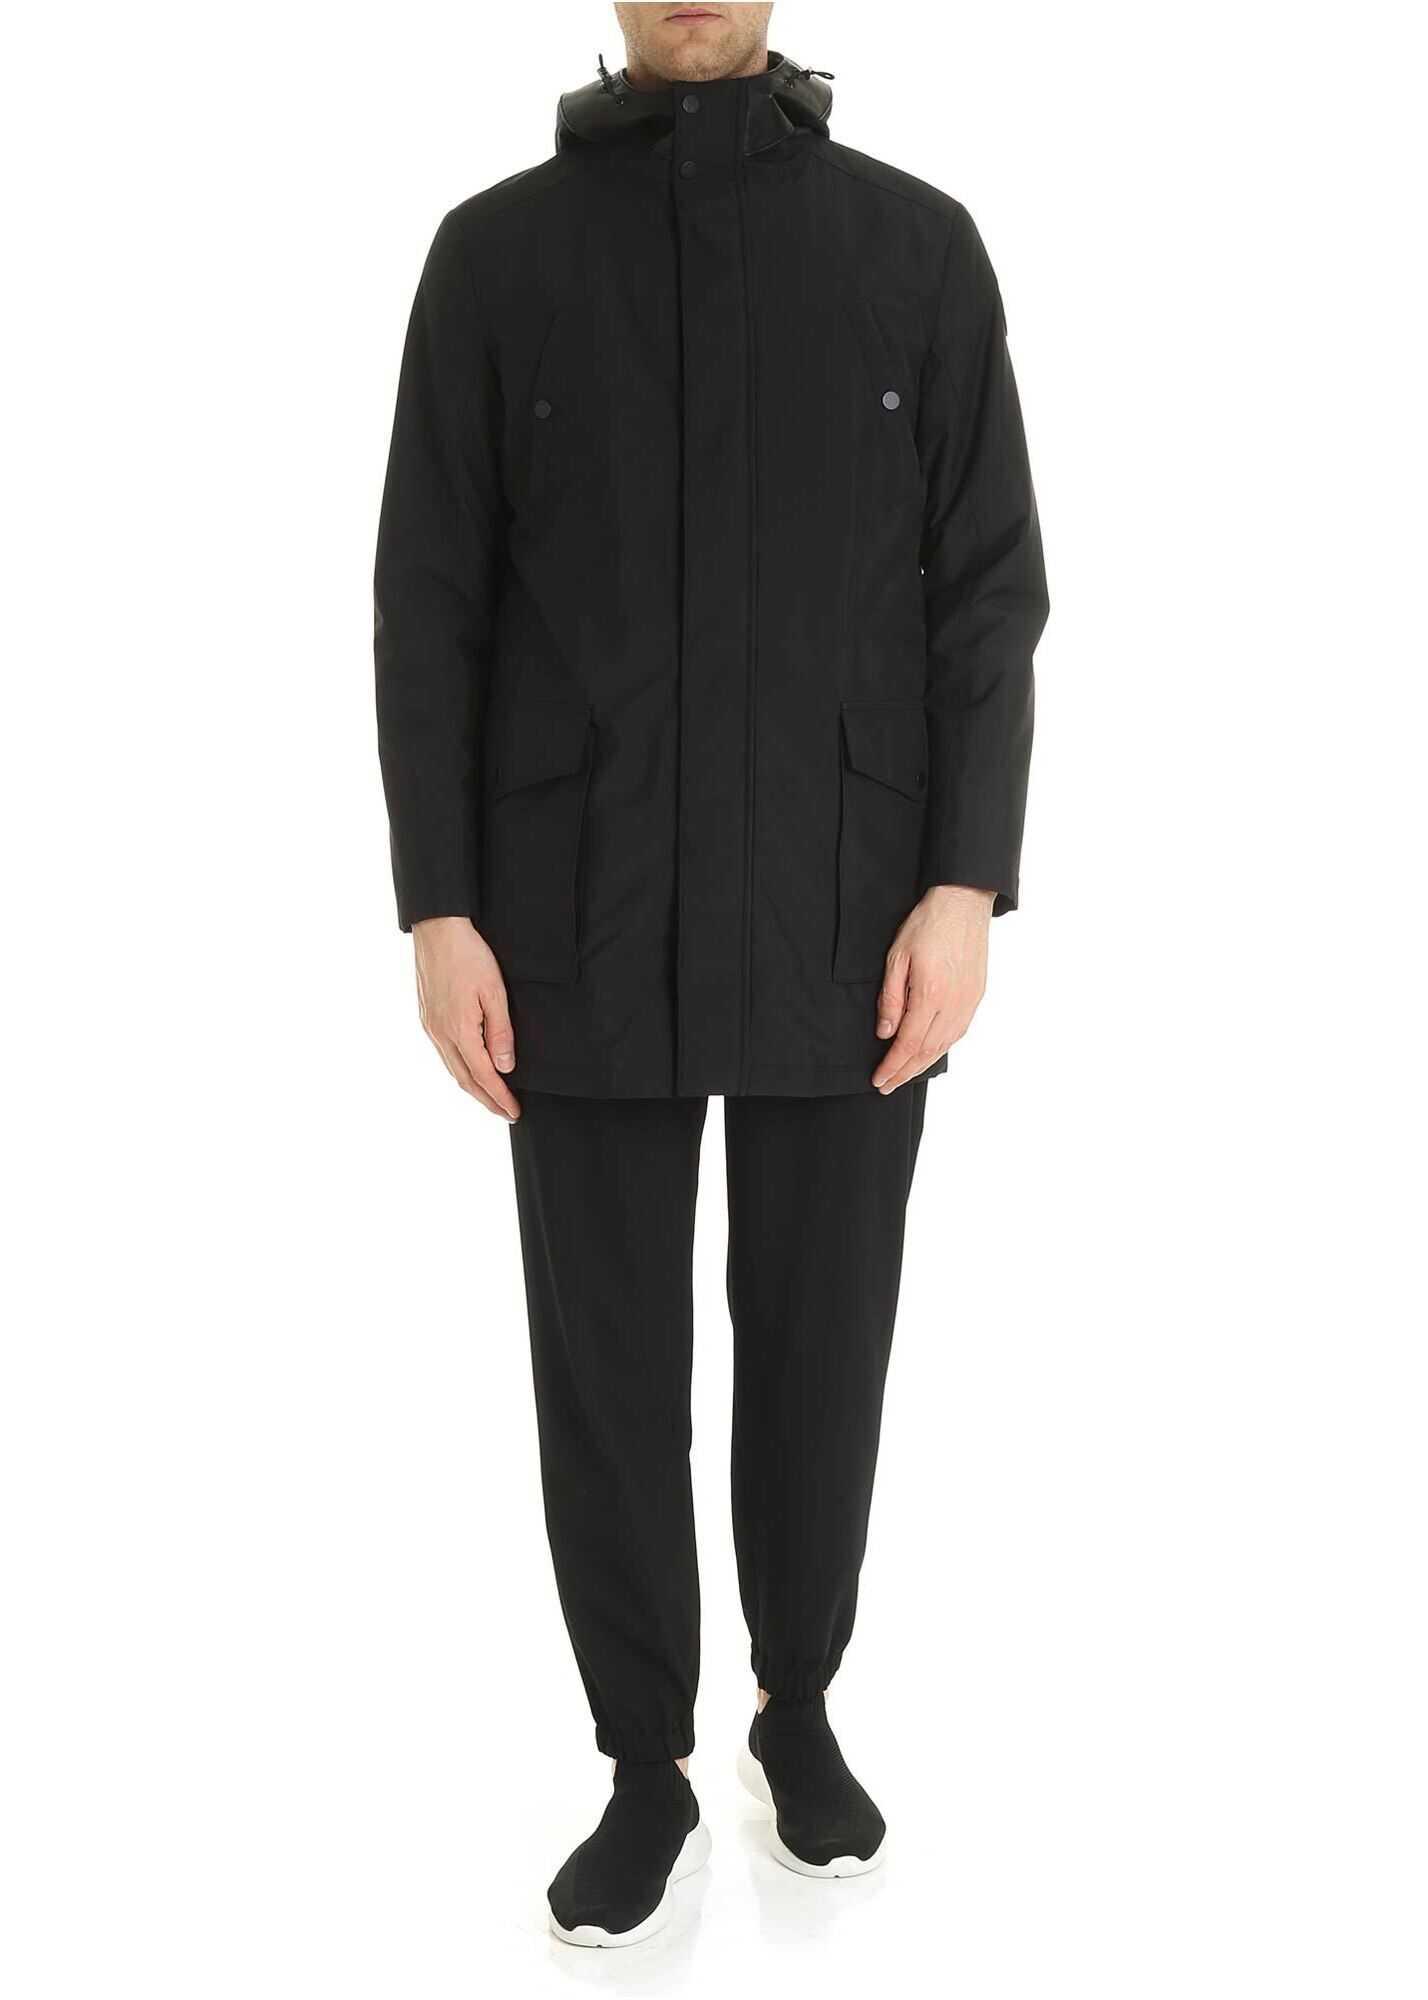 Karl Lagerfeld Leather Inserts Coat In Black Black imagine